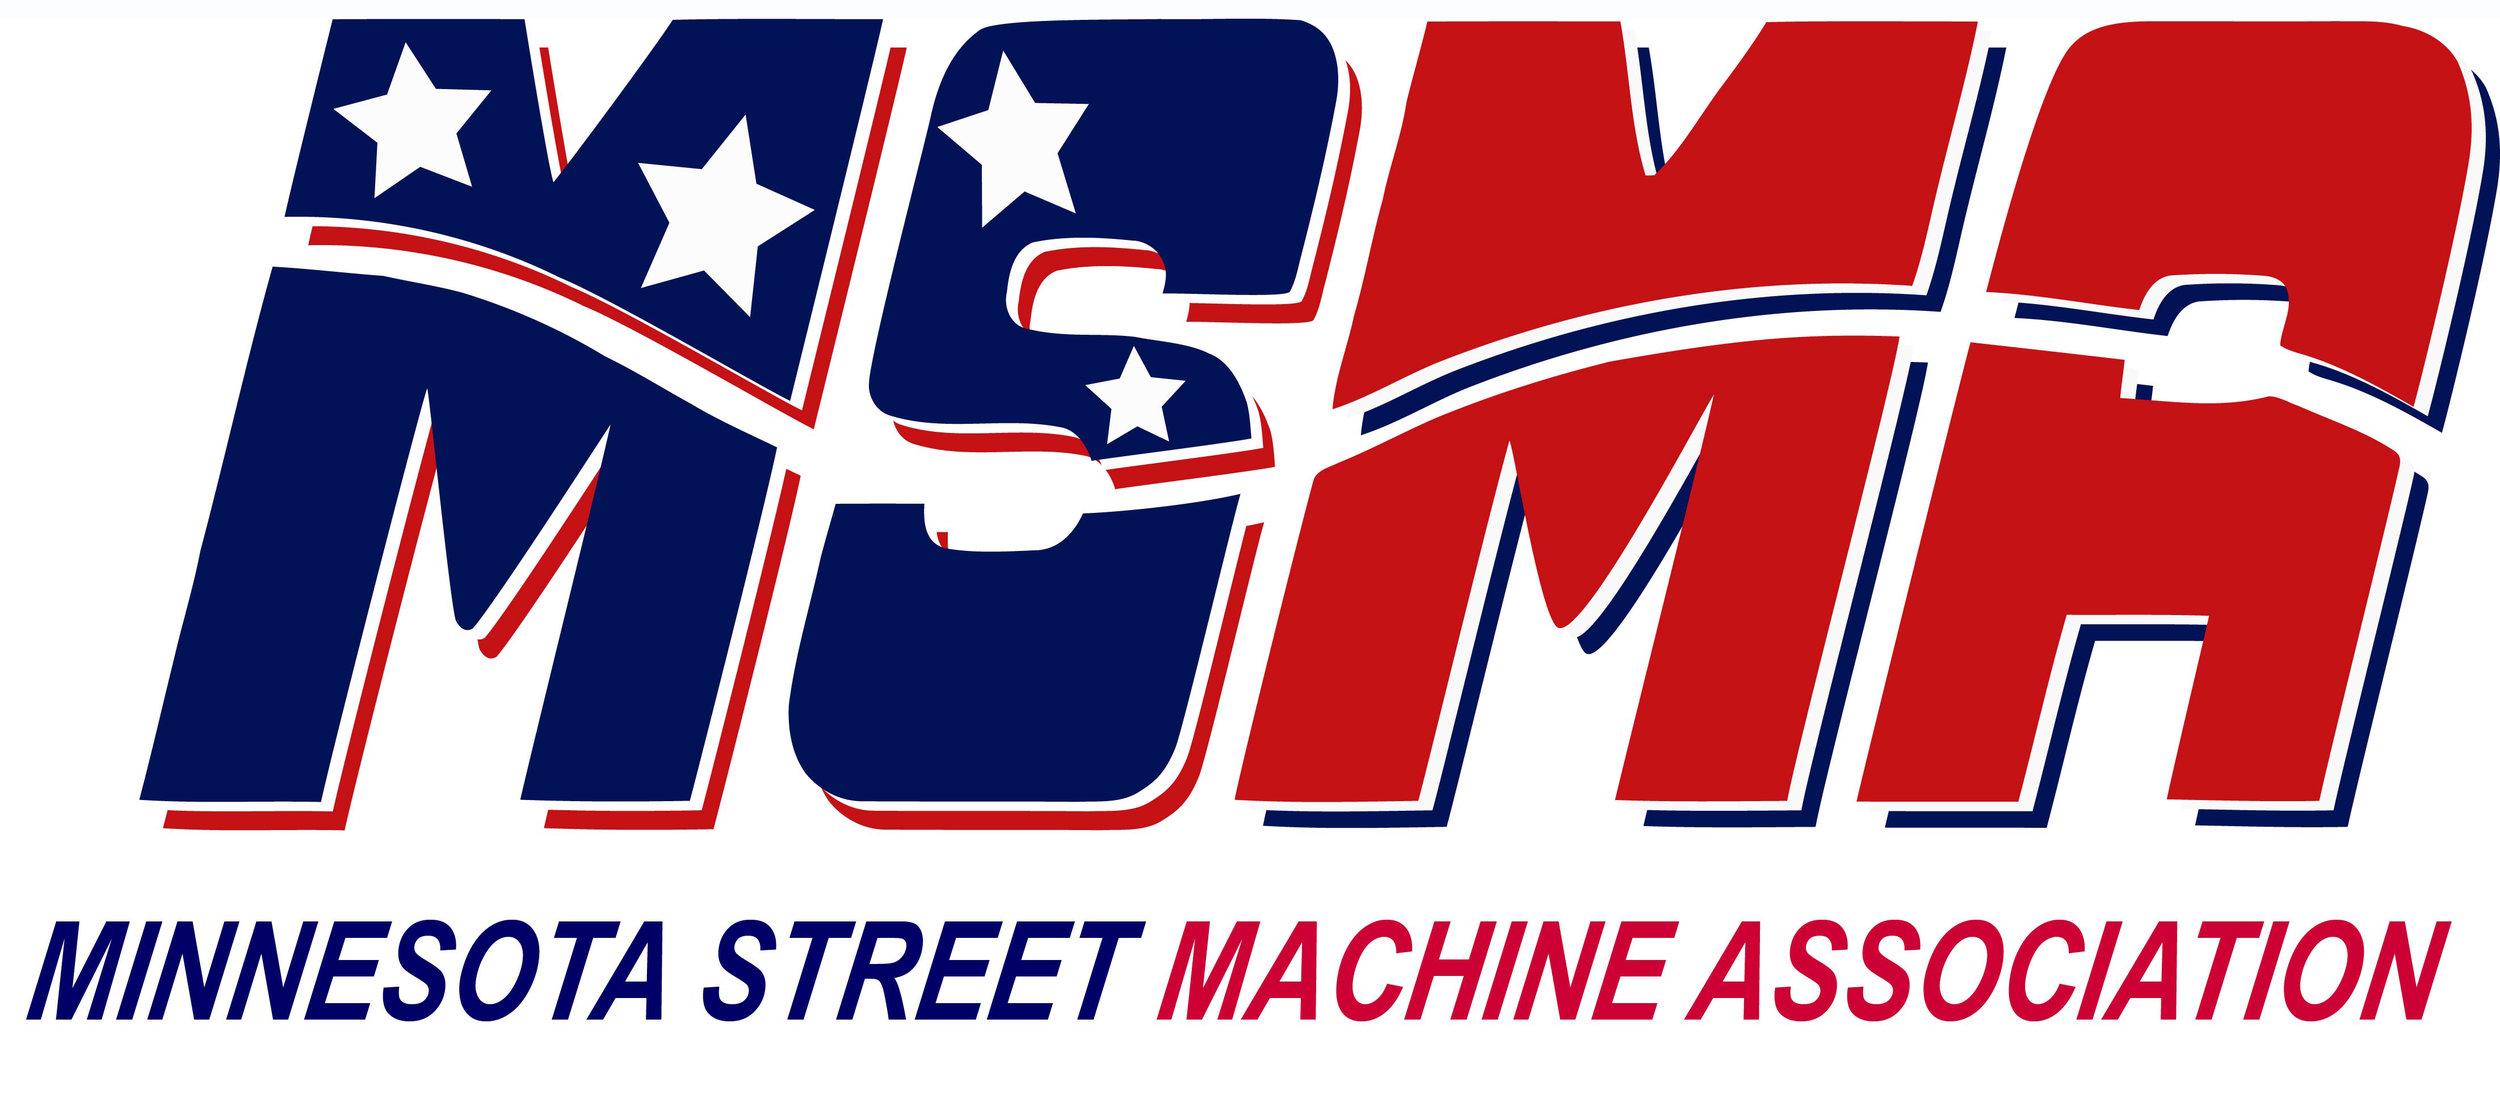 MSMA logo.jpg